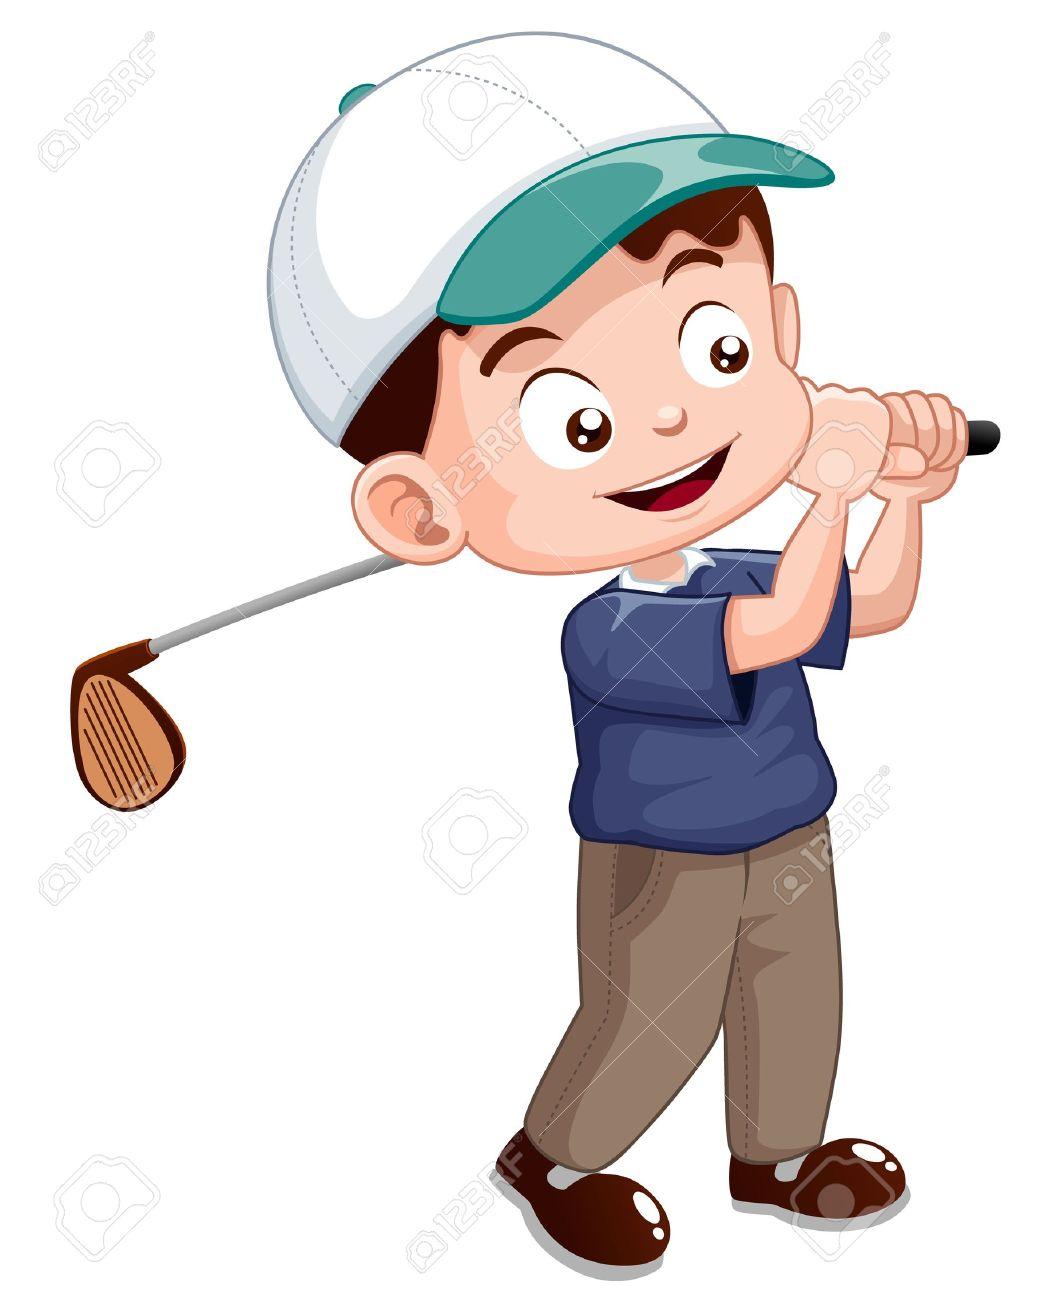 1056x1300 Golfer Images Clip Art